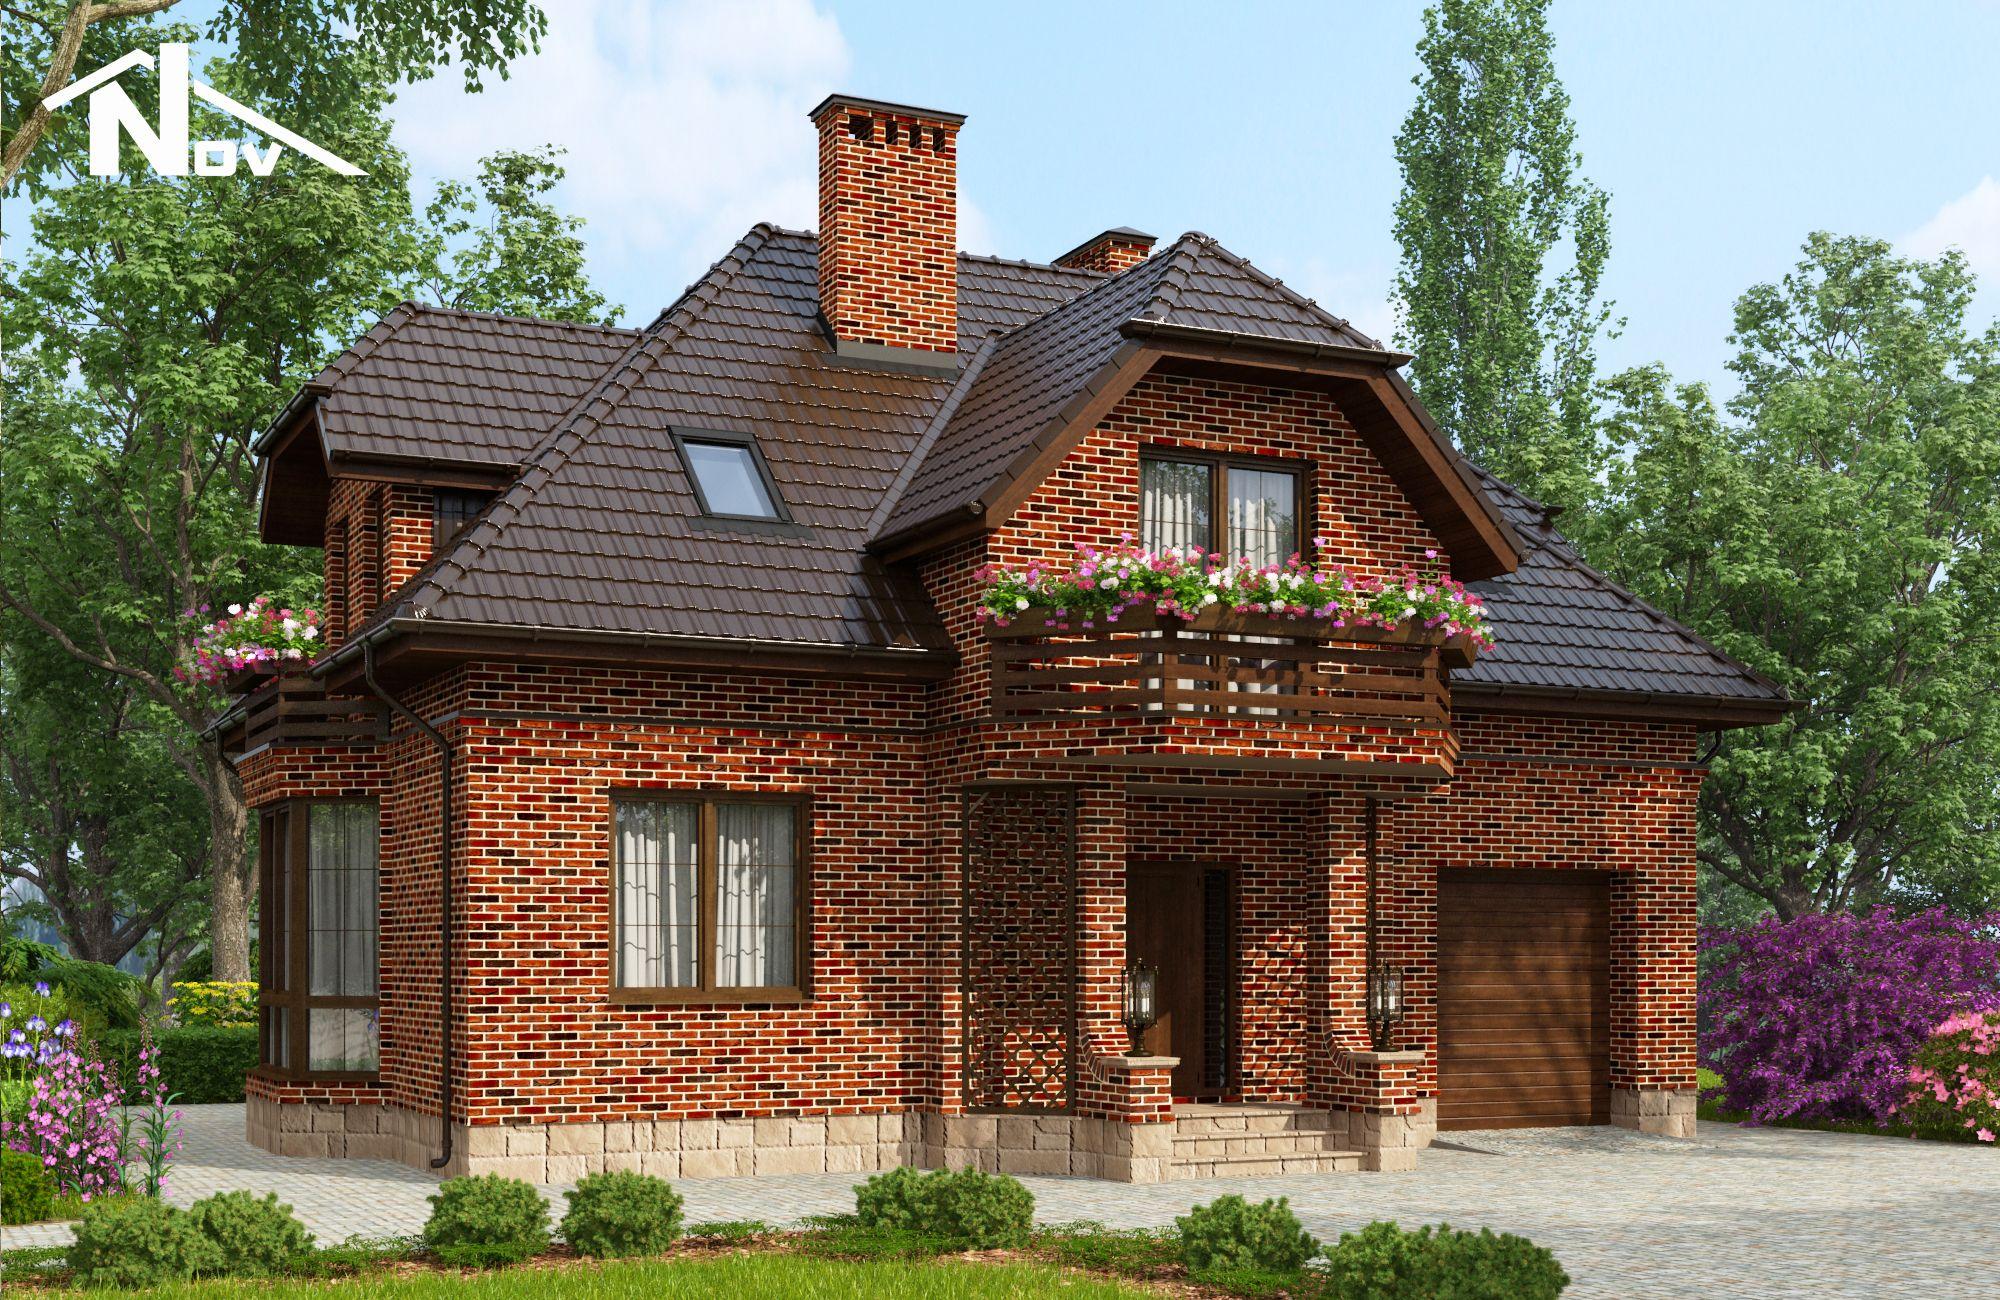 проект кирпичного дома для дачи фото э-маил